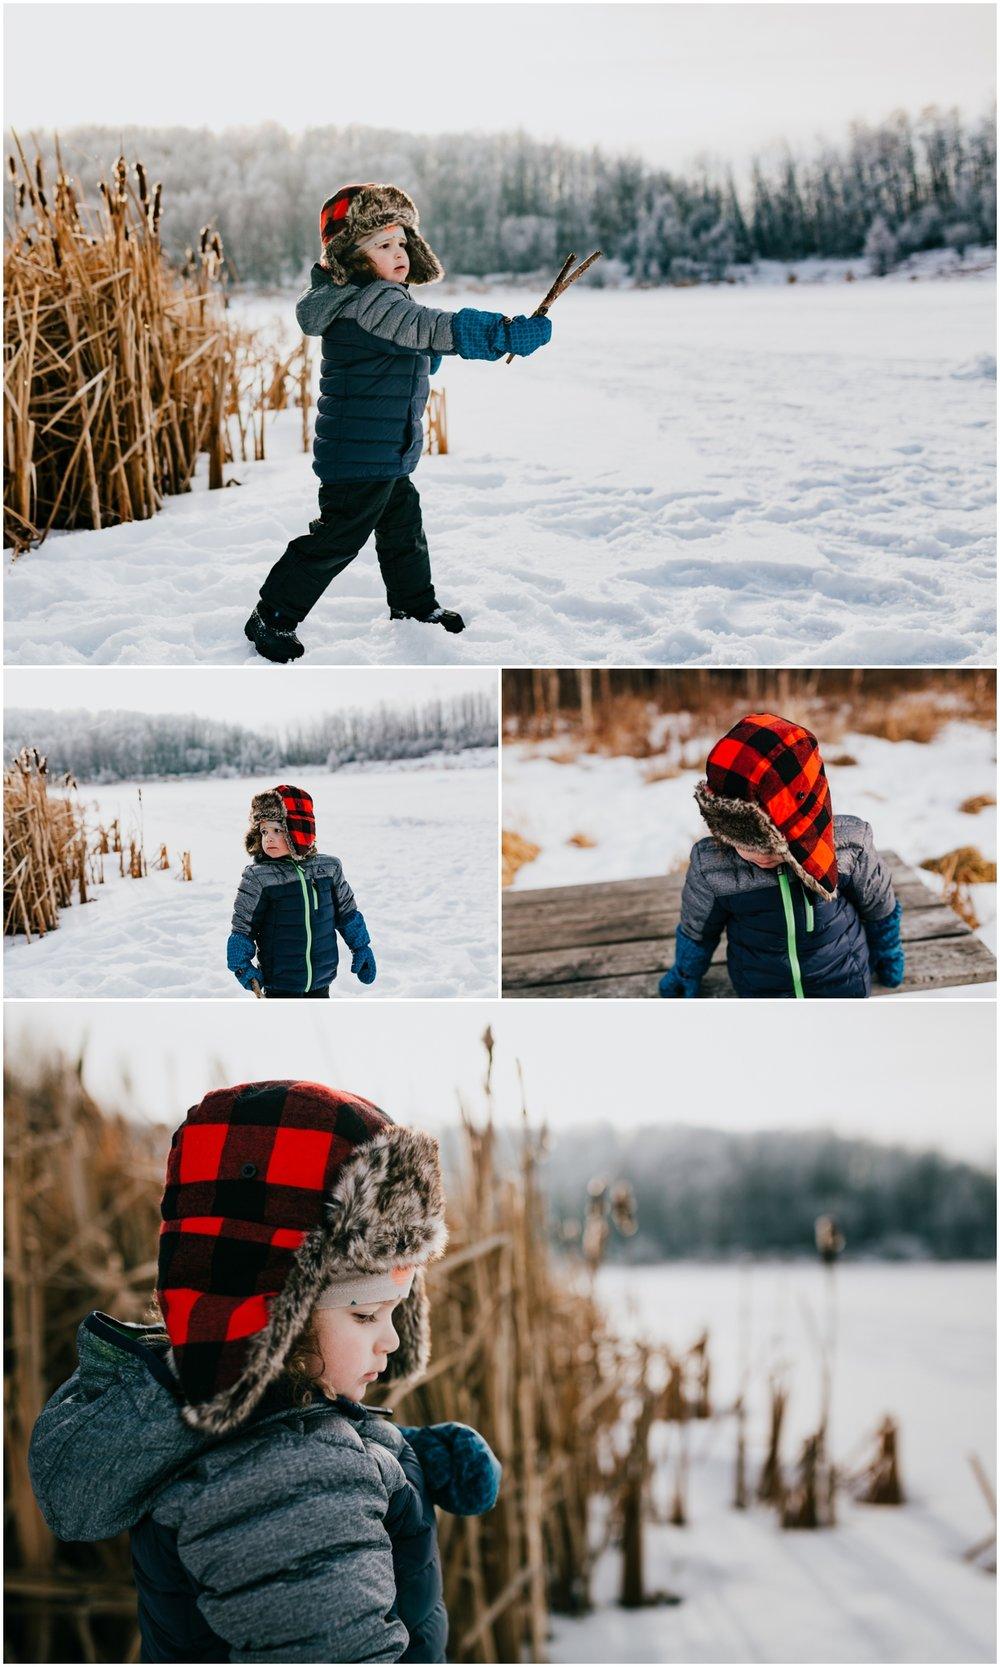 Edmonton Photographer - Cattails - Winter Lifestyle Photo Session - Kids on a frozen lake